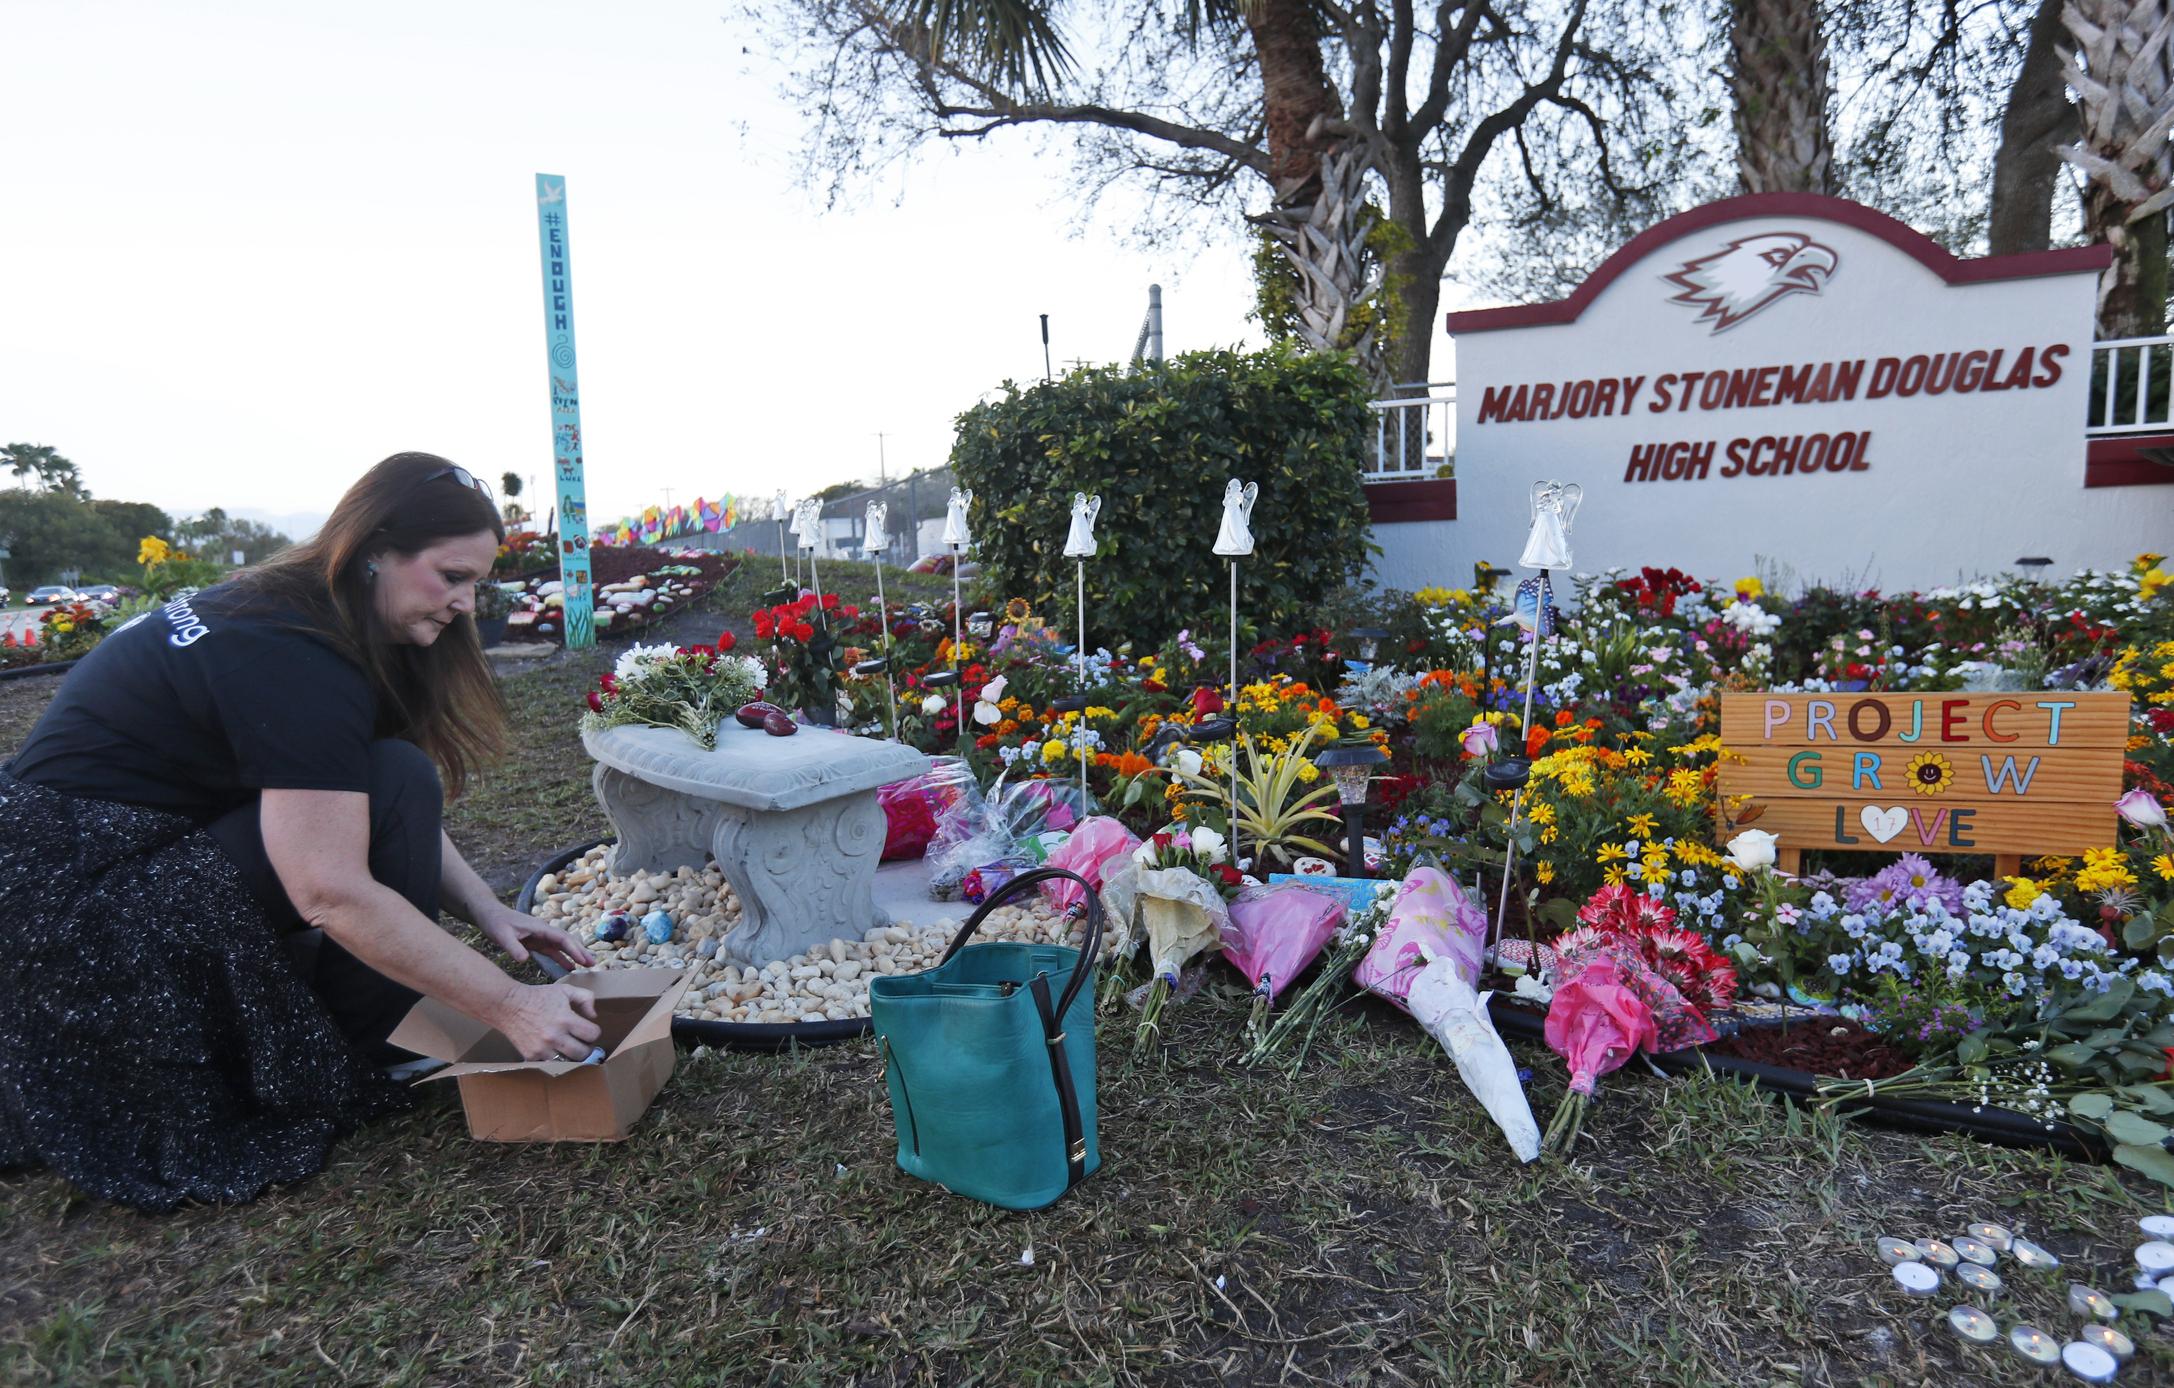 School_Shooting_Florida_79168-159532.jpg71978627